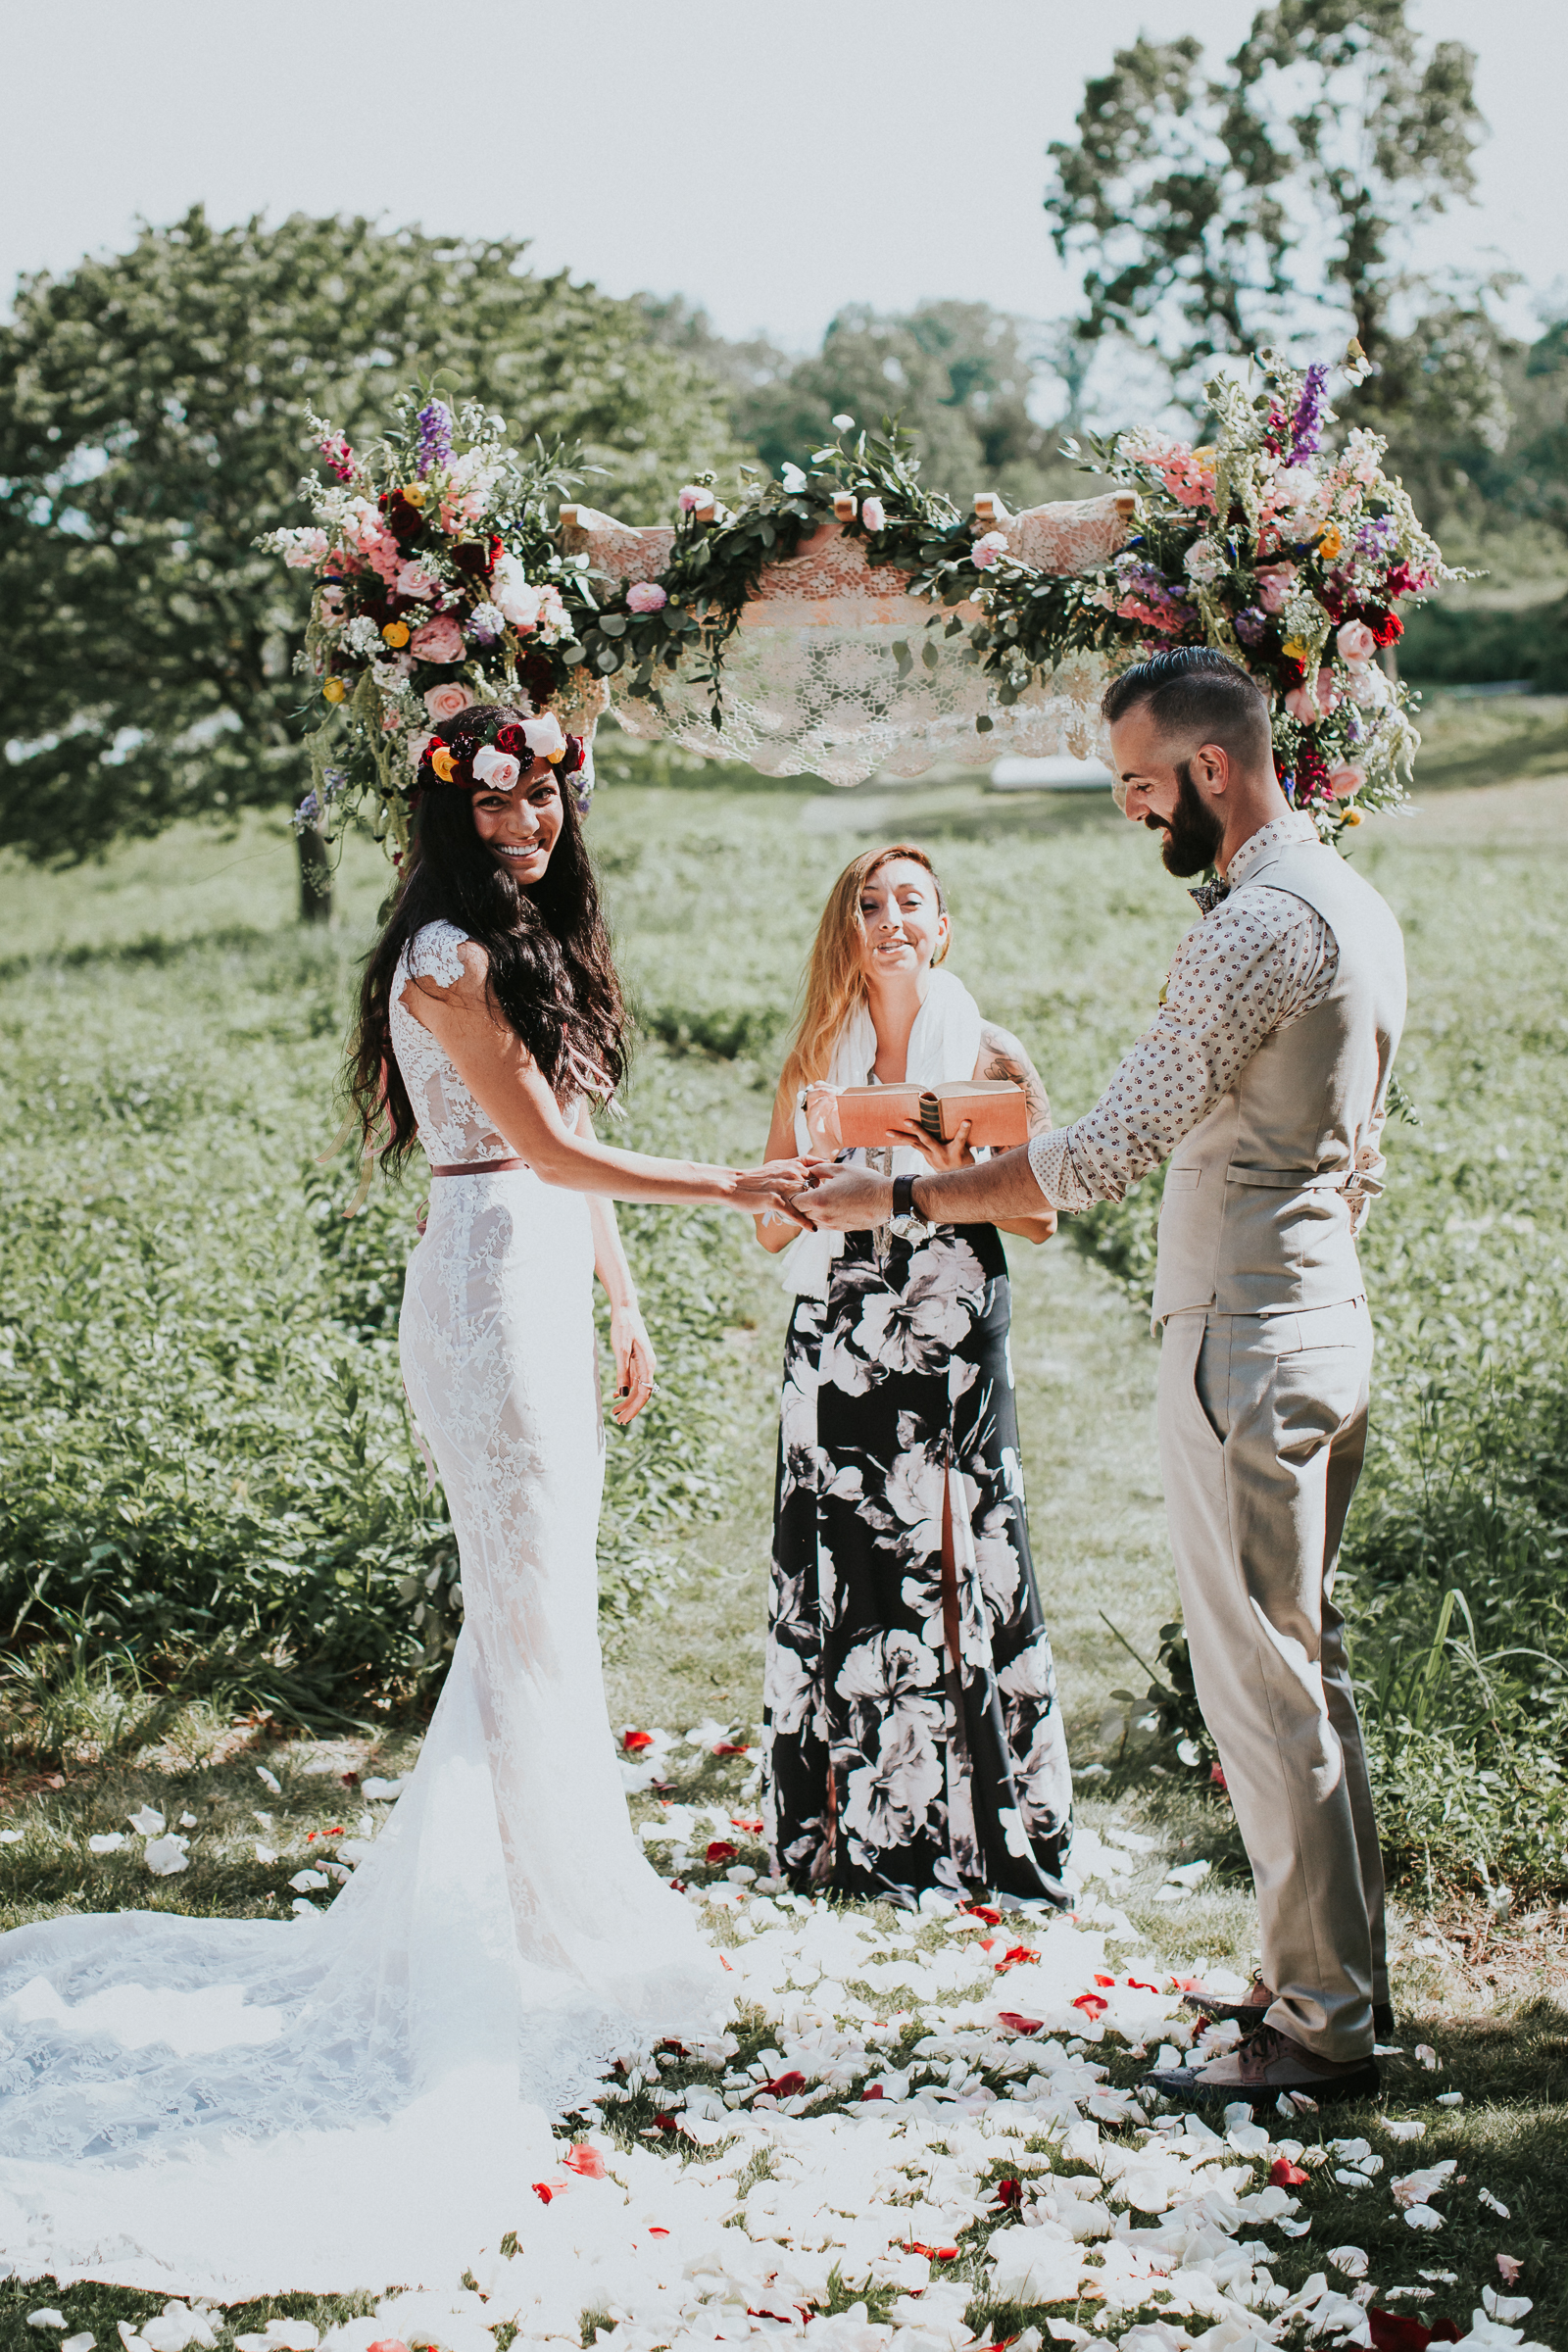 Backyard-Intimate-Adventurous-Destination-Wedding-Darien-Connecticut-Documentary-Wedding-Photography-56.jpg